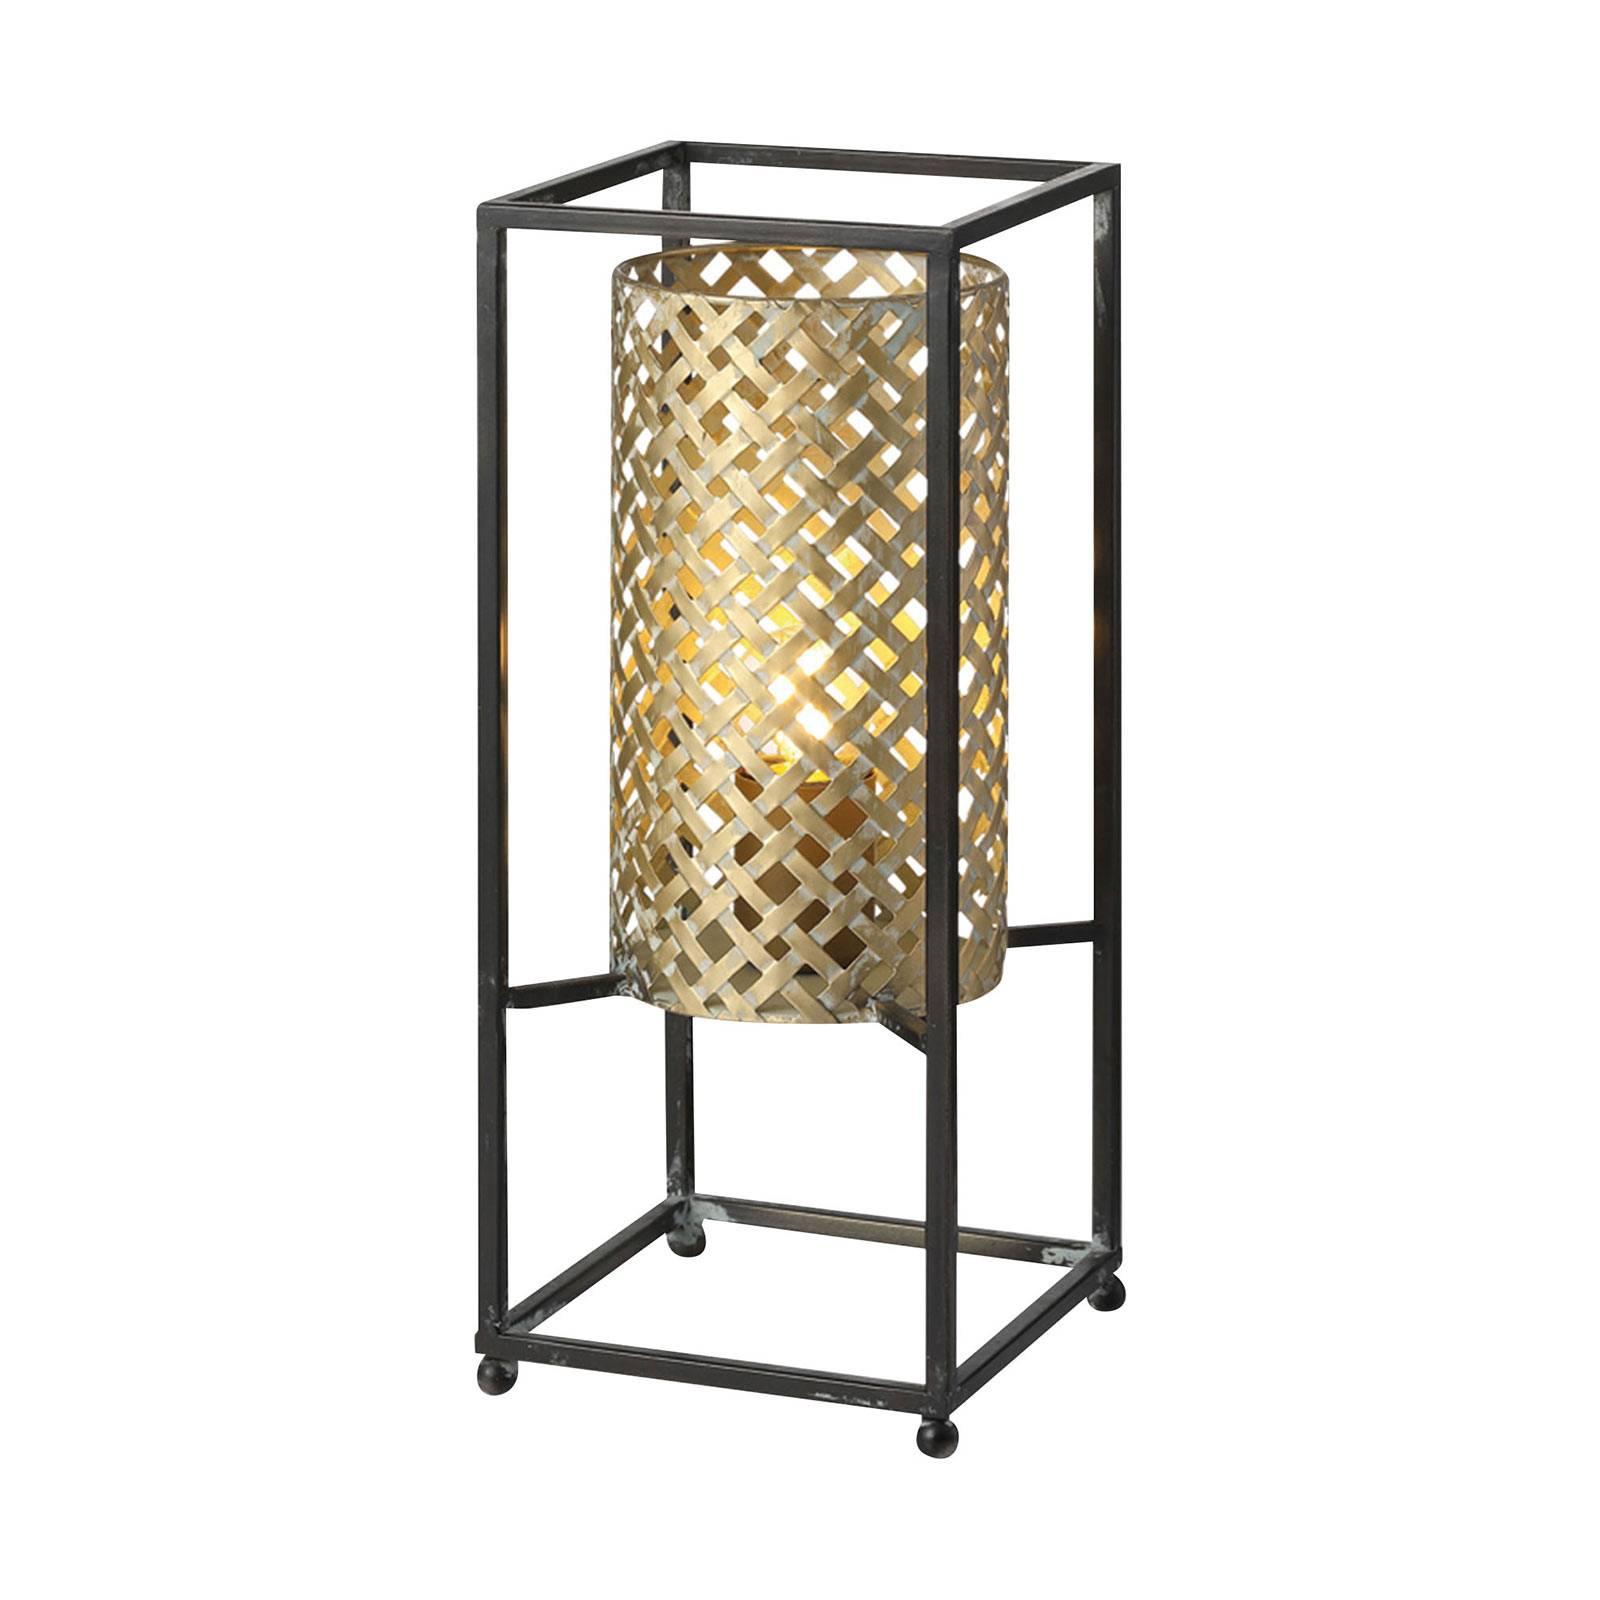 Tafellamp Petrolio, zwart / goud, hoogte 37 cm